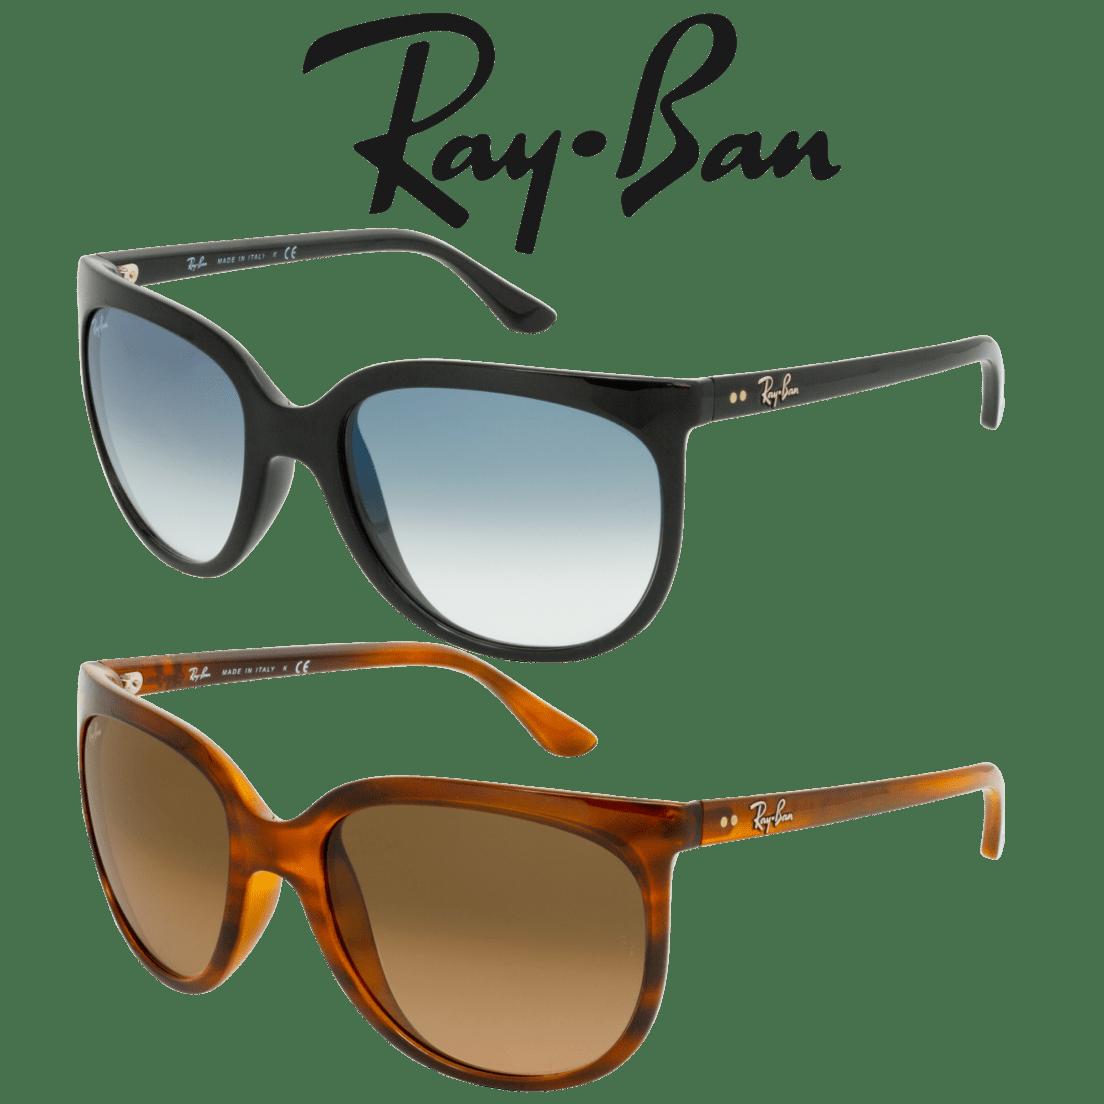 fd0b545498 Ray-Ban CATS 1000 RB4126 Sunglasses